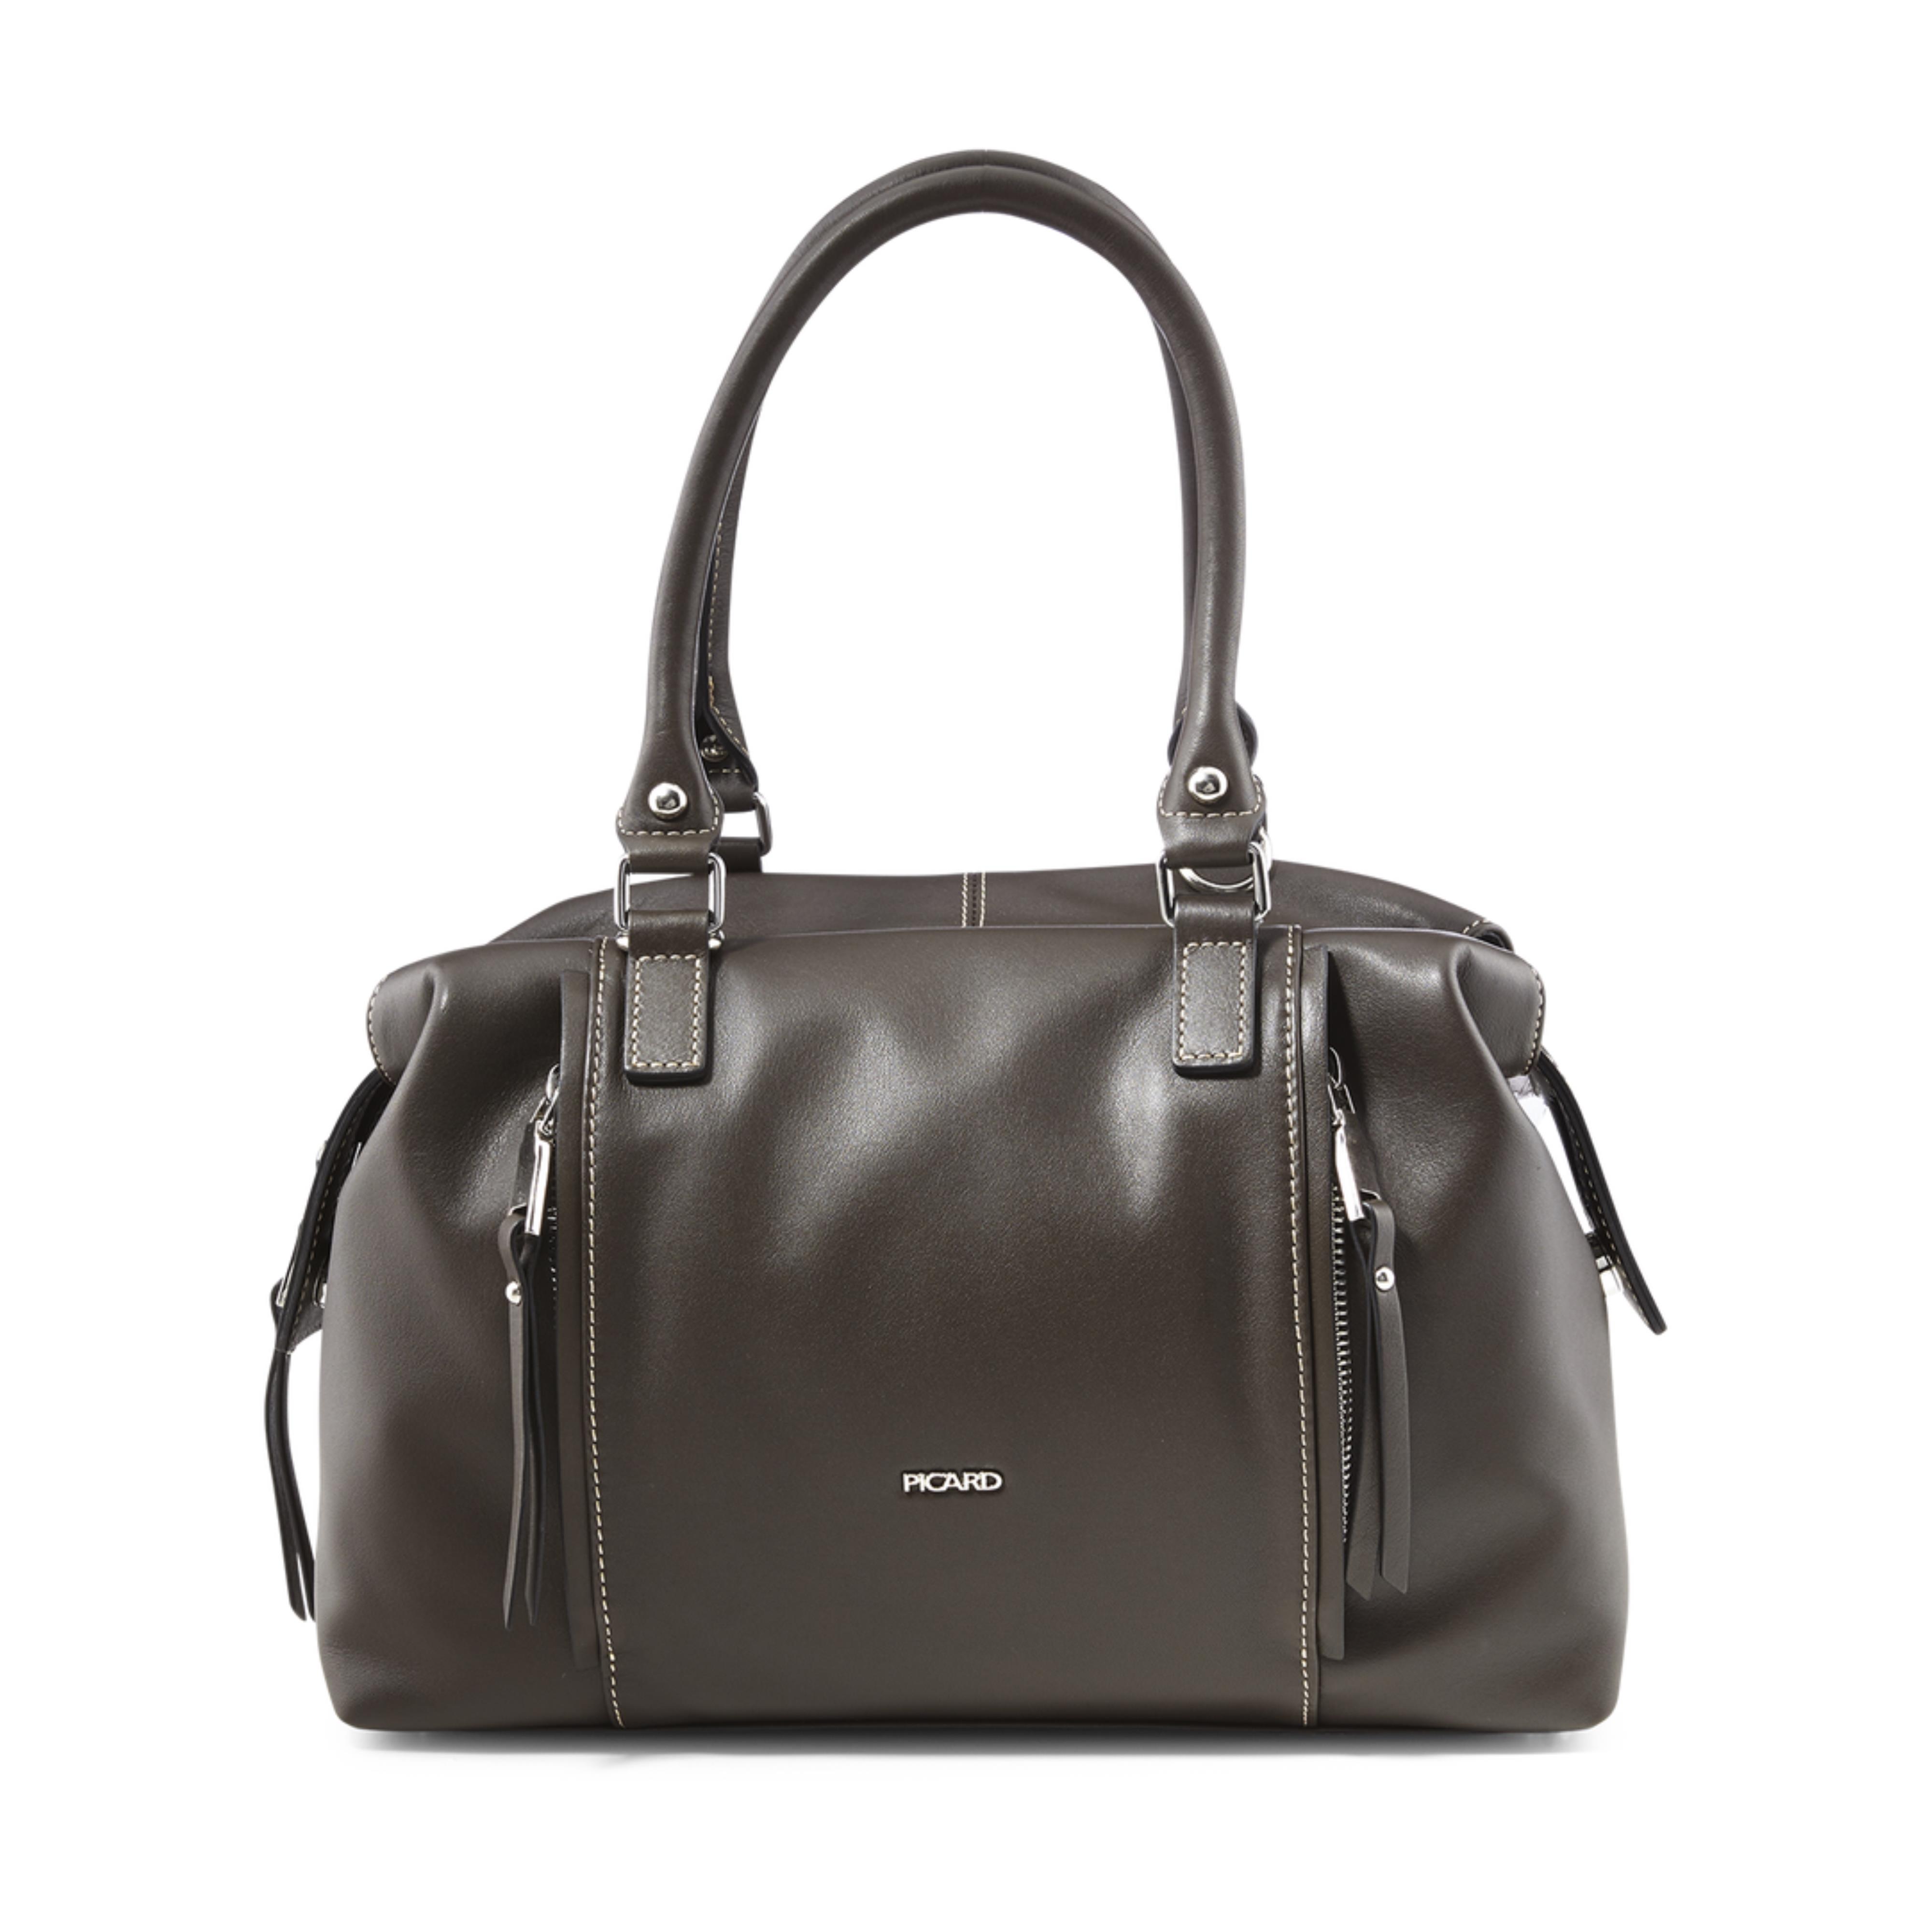 67340a021f8cf PICARD Damen Tasche Shopper Dashing Taupe 9307 Marke Picard